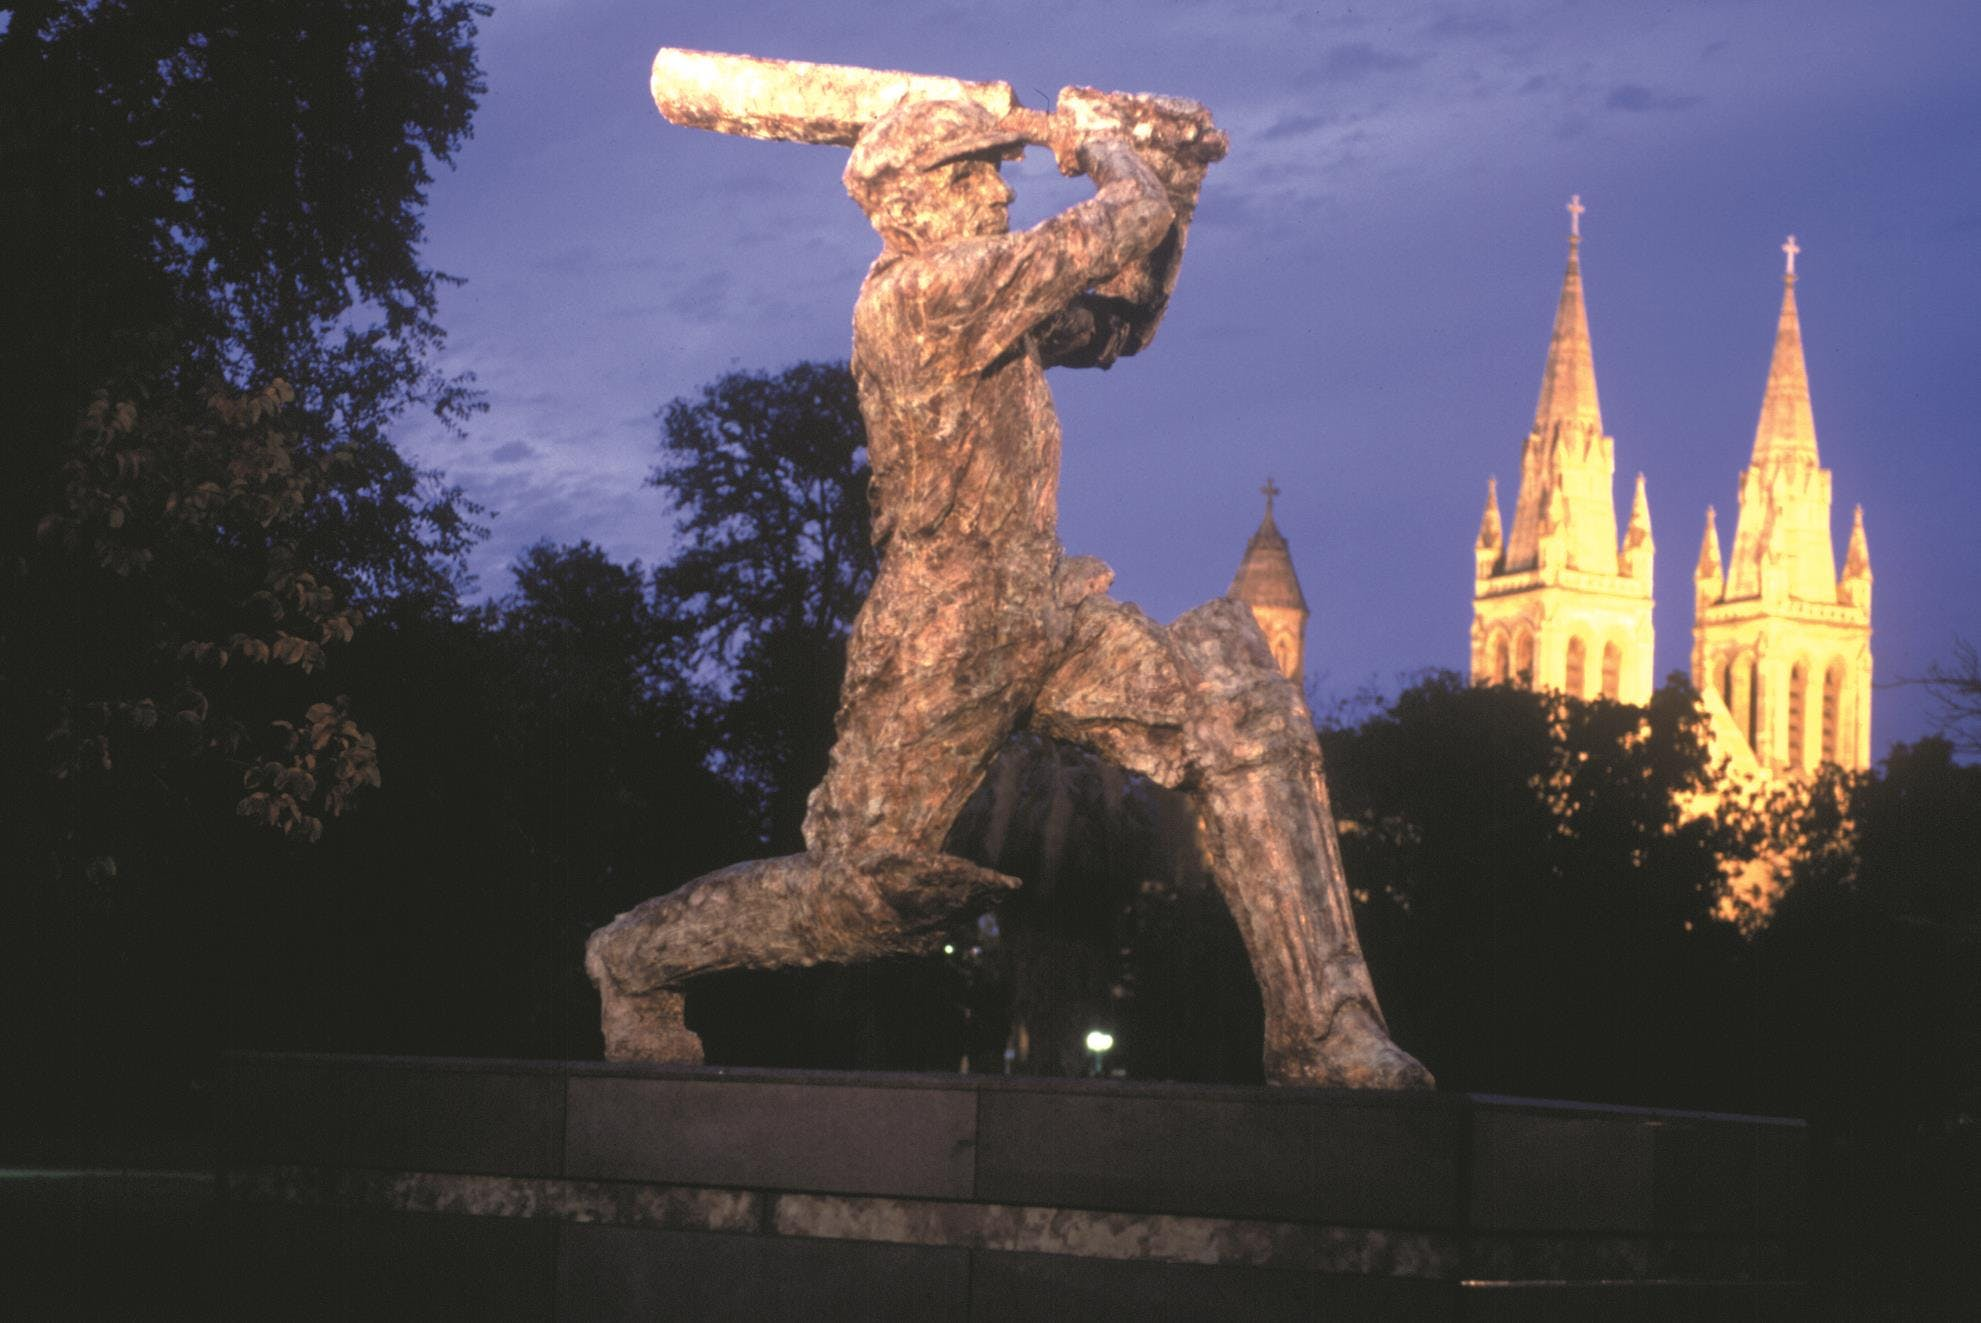 Commemorative sculpture